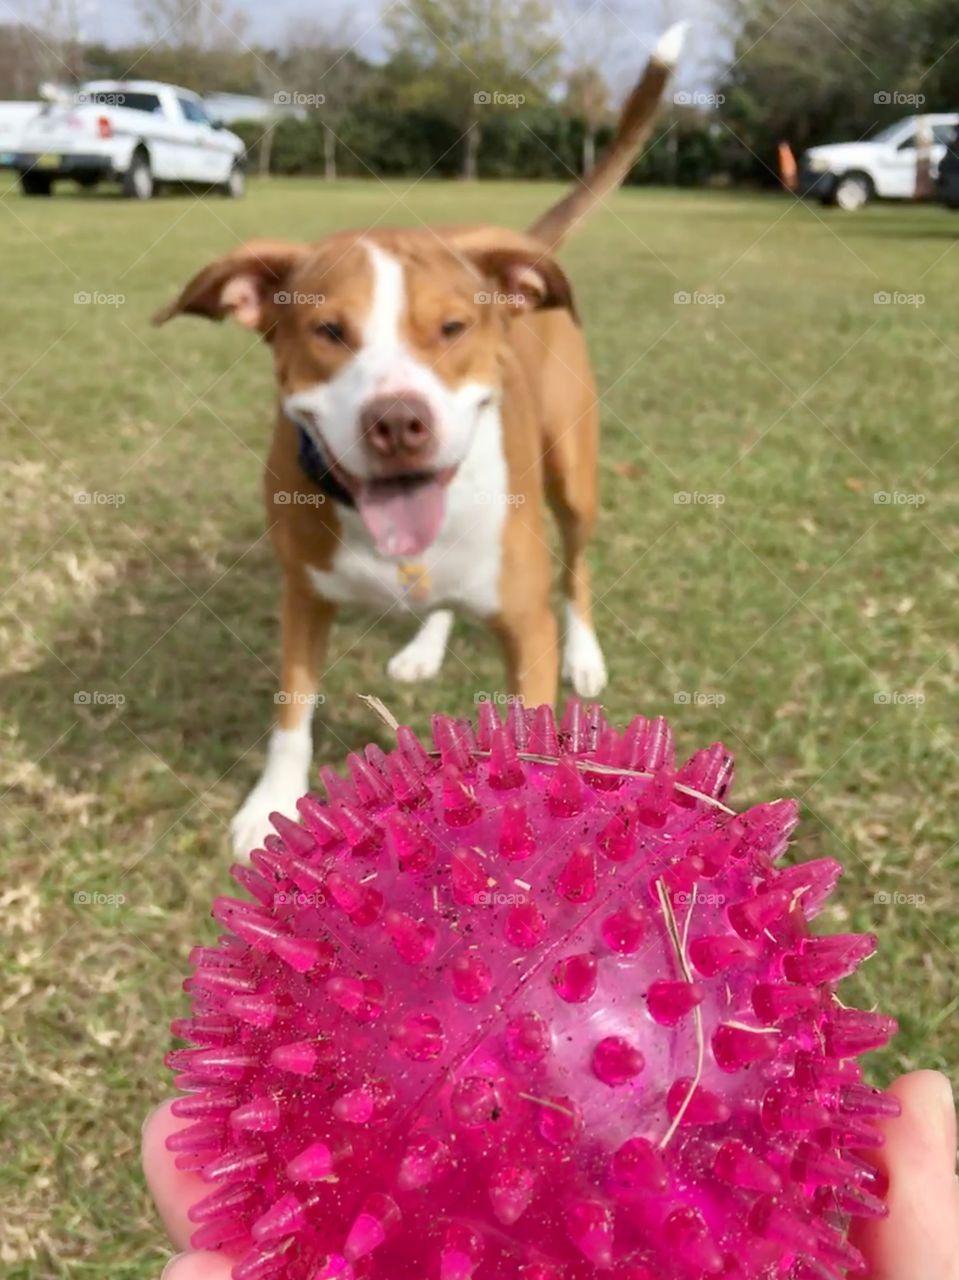 A good dog and his pink ball